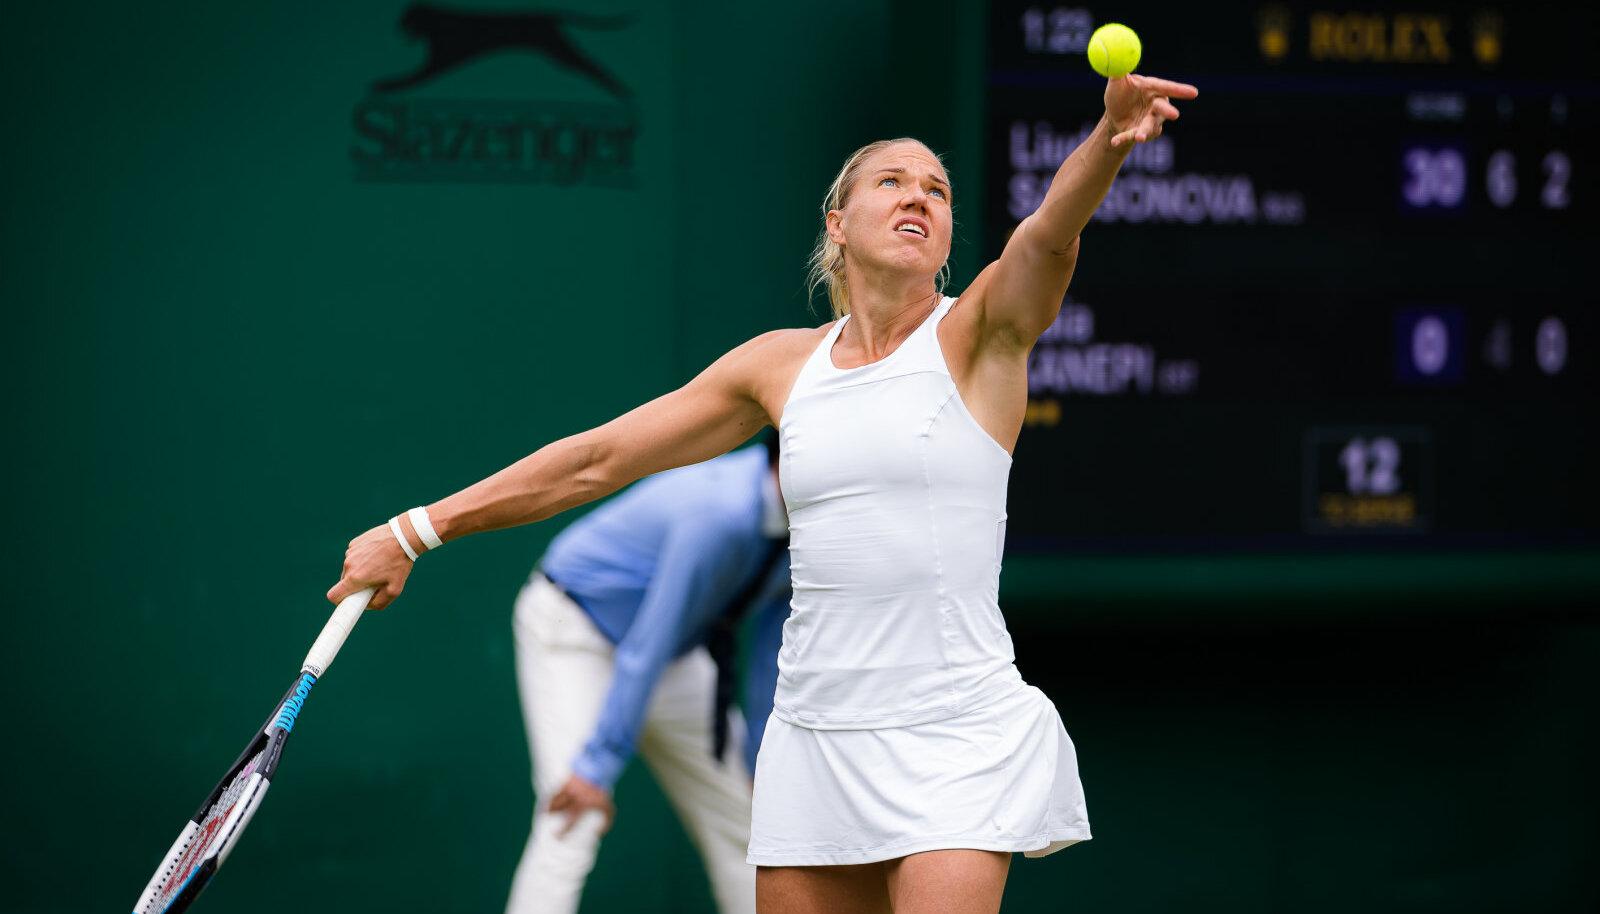 Kaia Kanepi Wimbledoni turniiri avaringis Ljudmila Samsonova vastu.